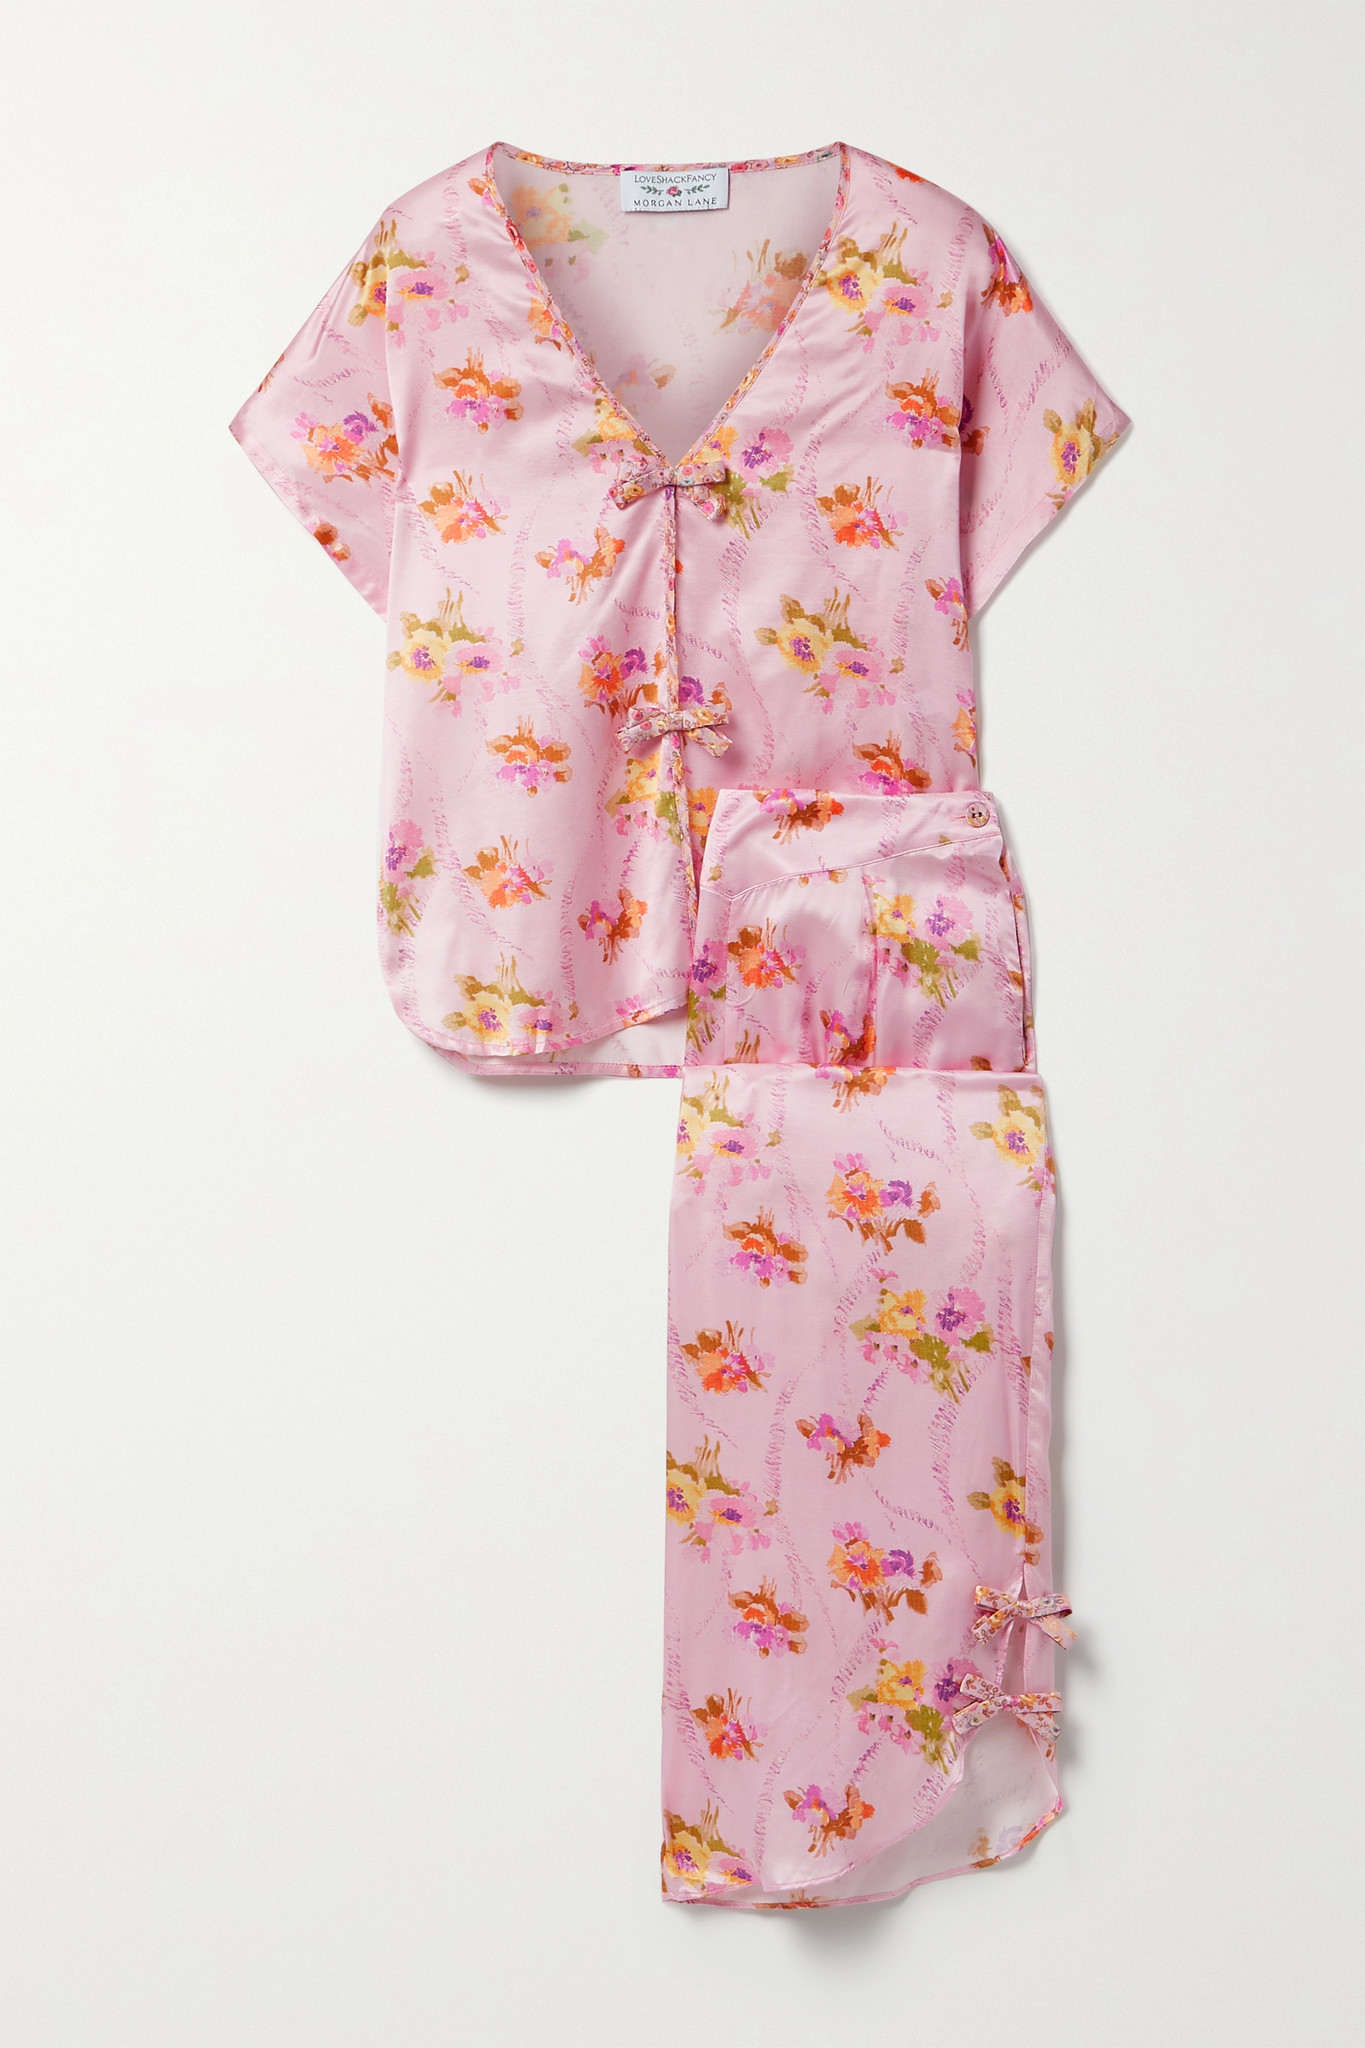 MORGAN LANE - + Loveshackfancy Joanie Margo Floral-print Satin Pajama Set - Pink - medium